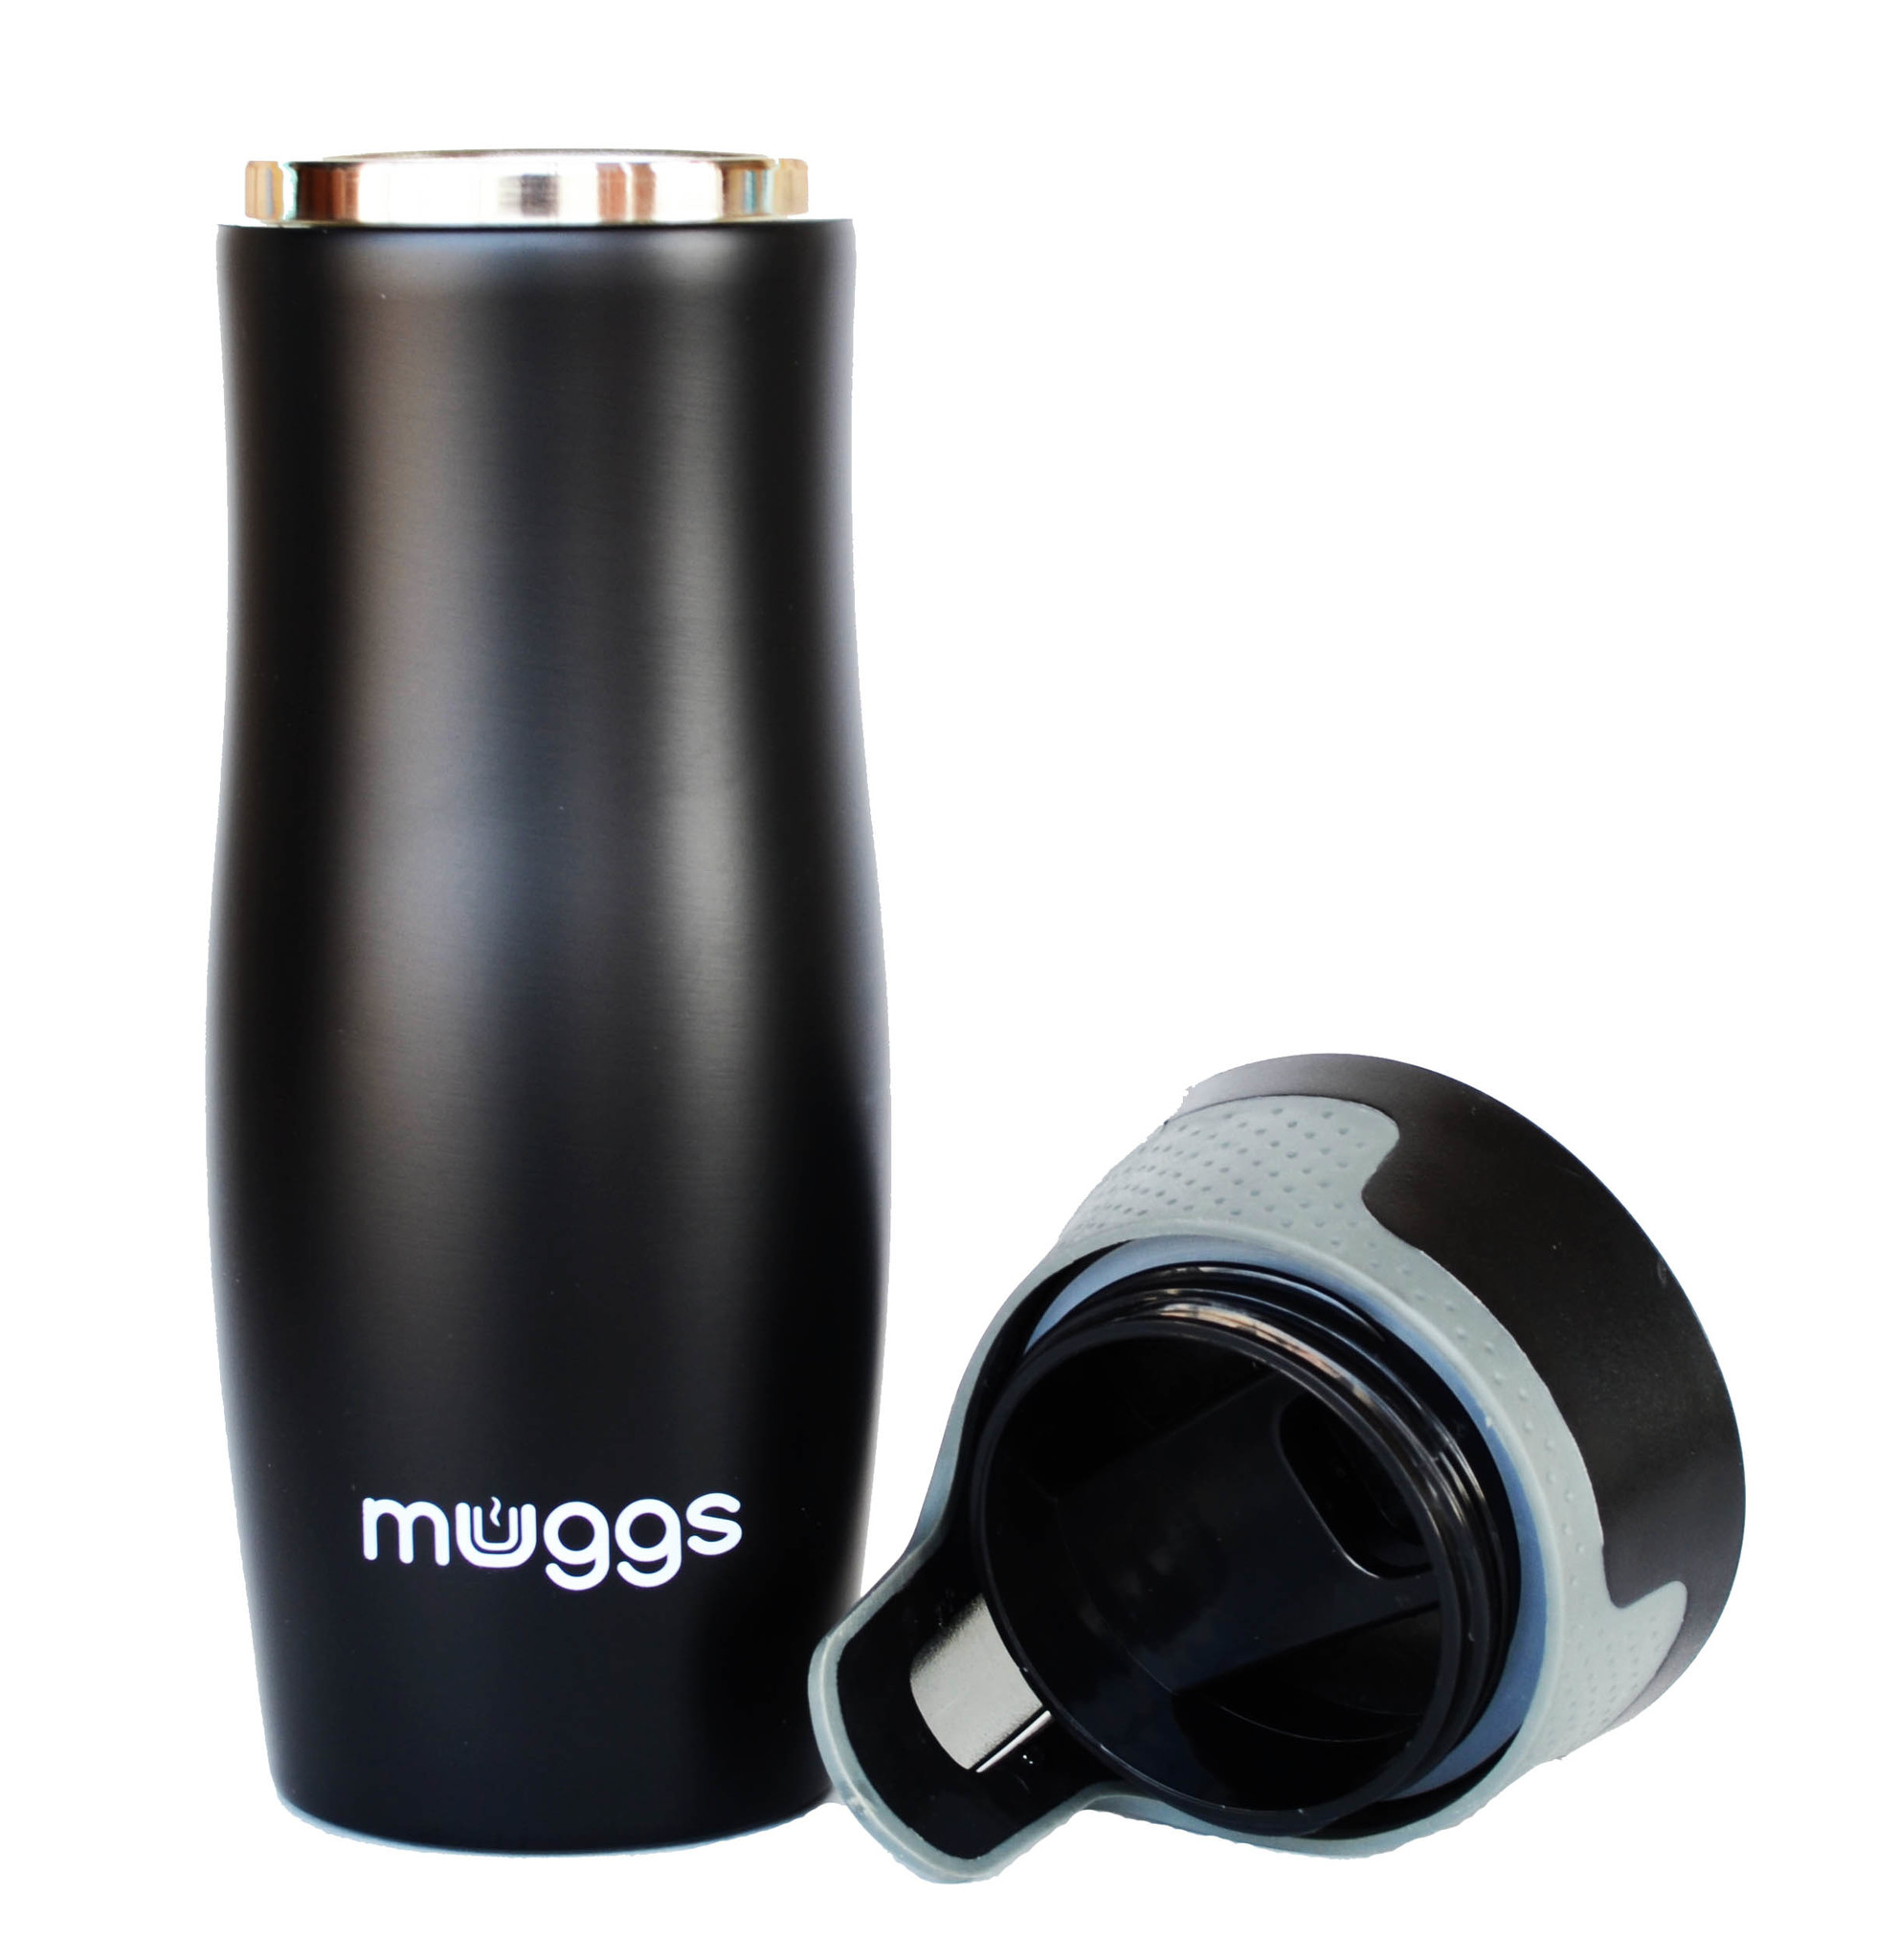 Термокружка Muggs Button 450 мл. черная